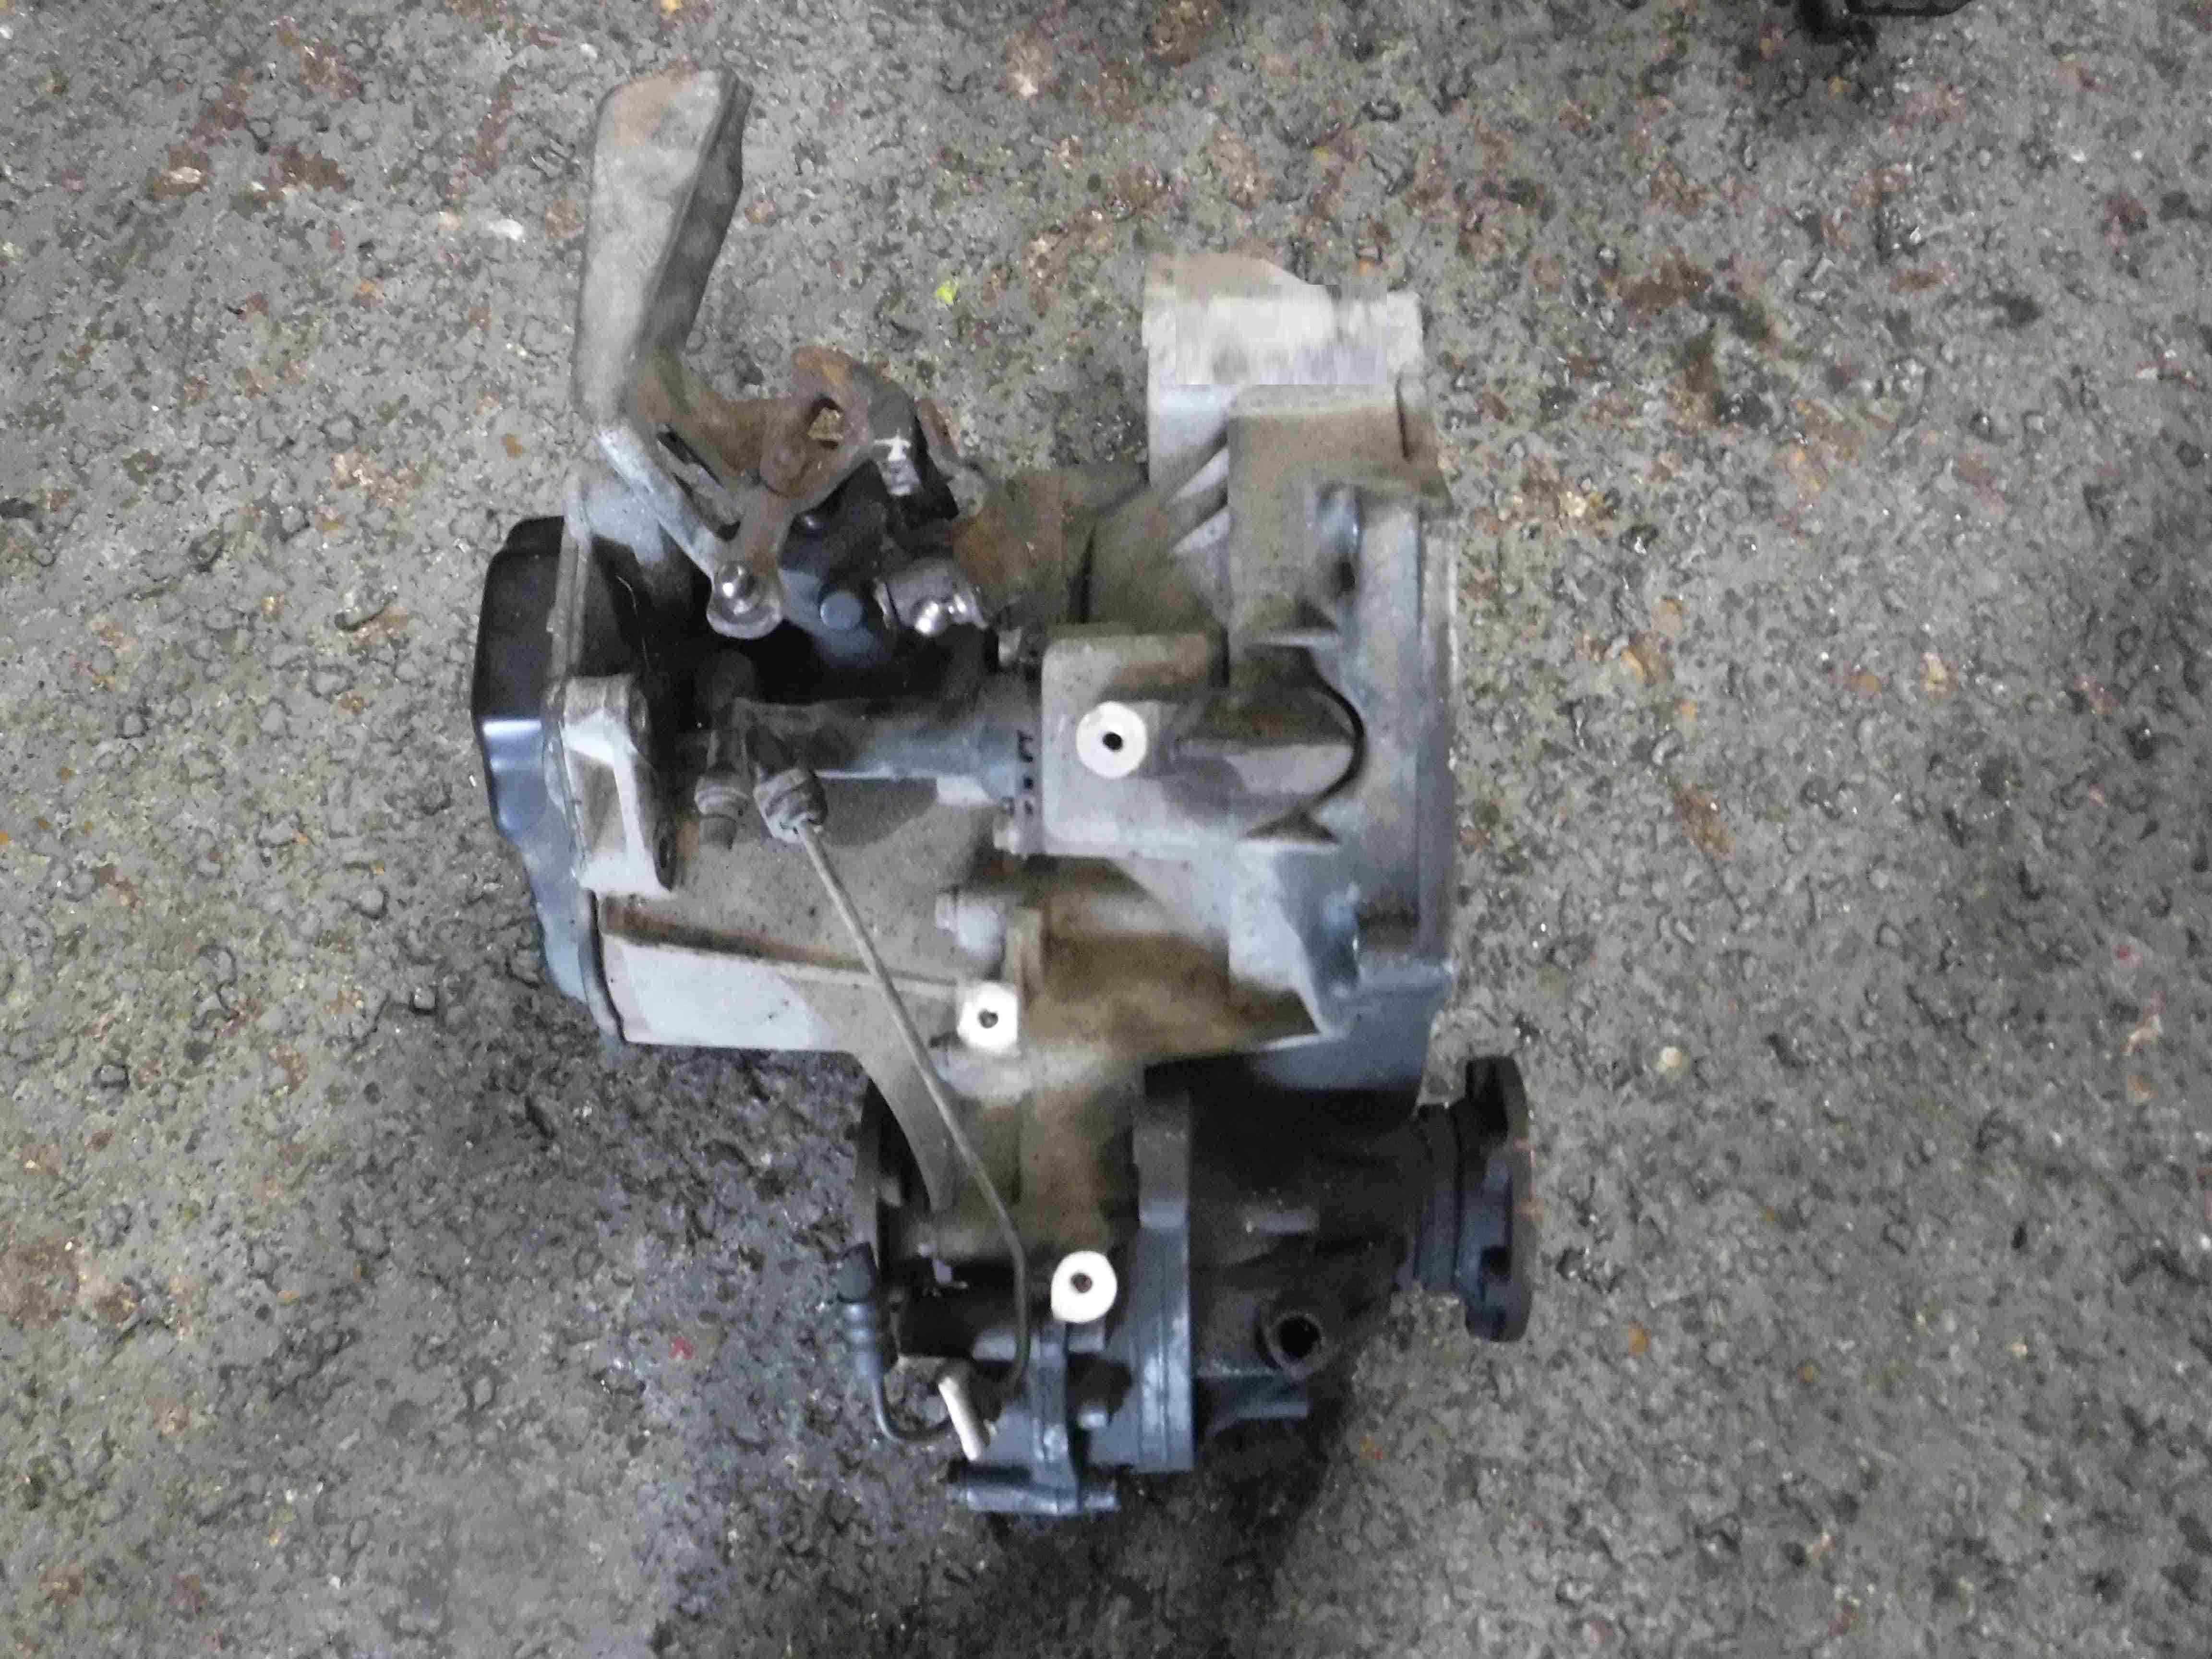 Volkswagen Polo 2003-2006 9N 1.4 tDi Gearbox GGV